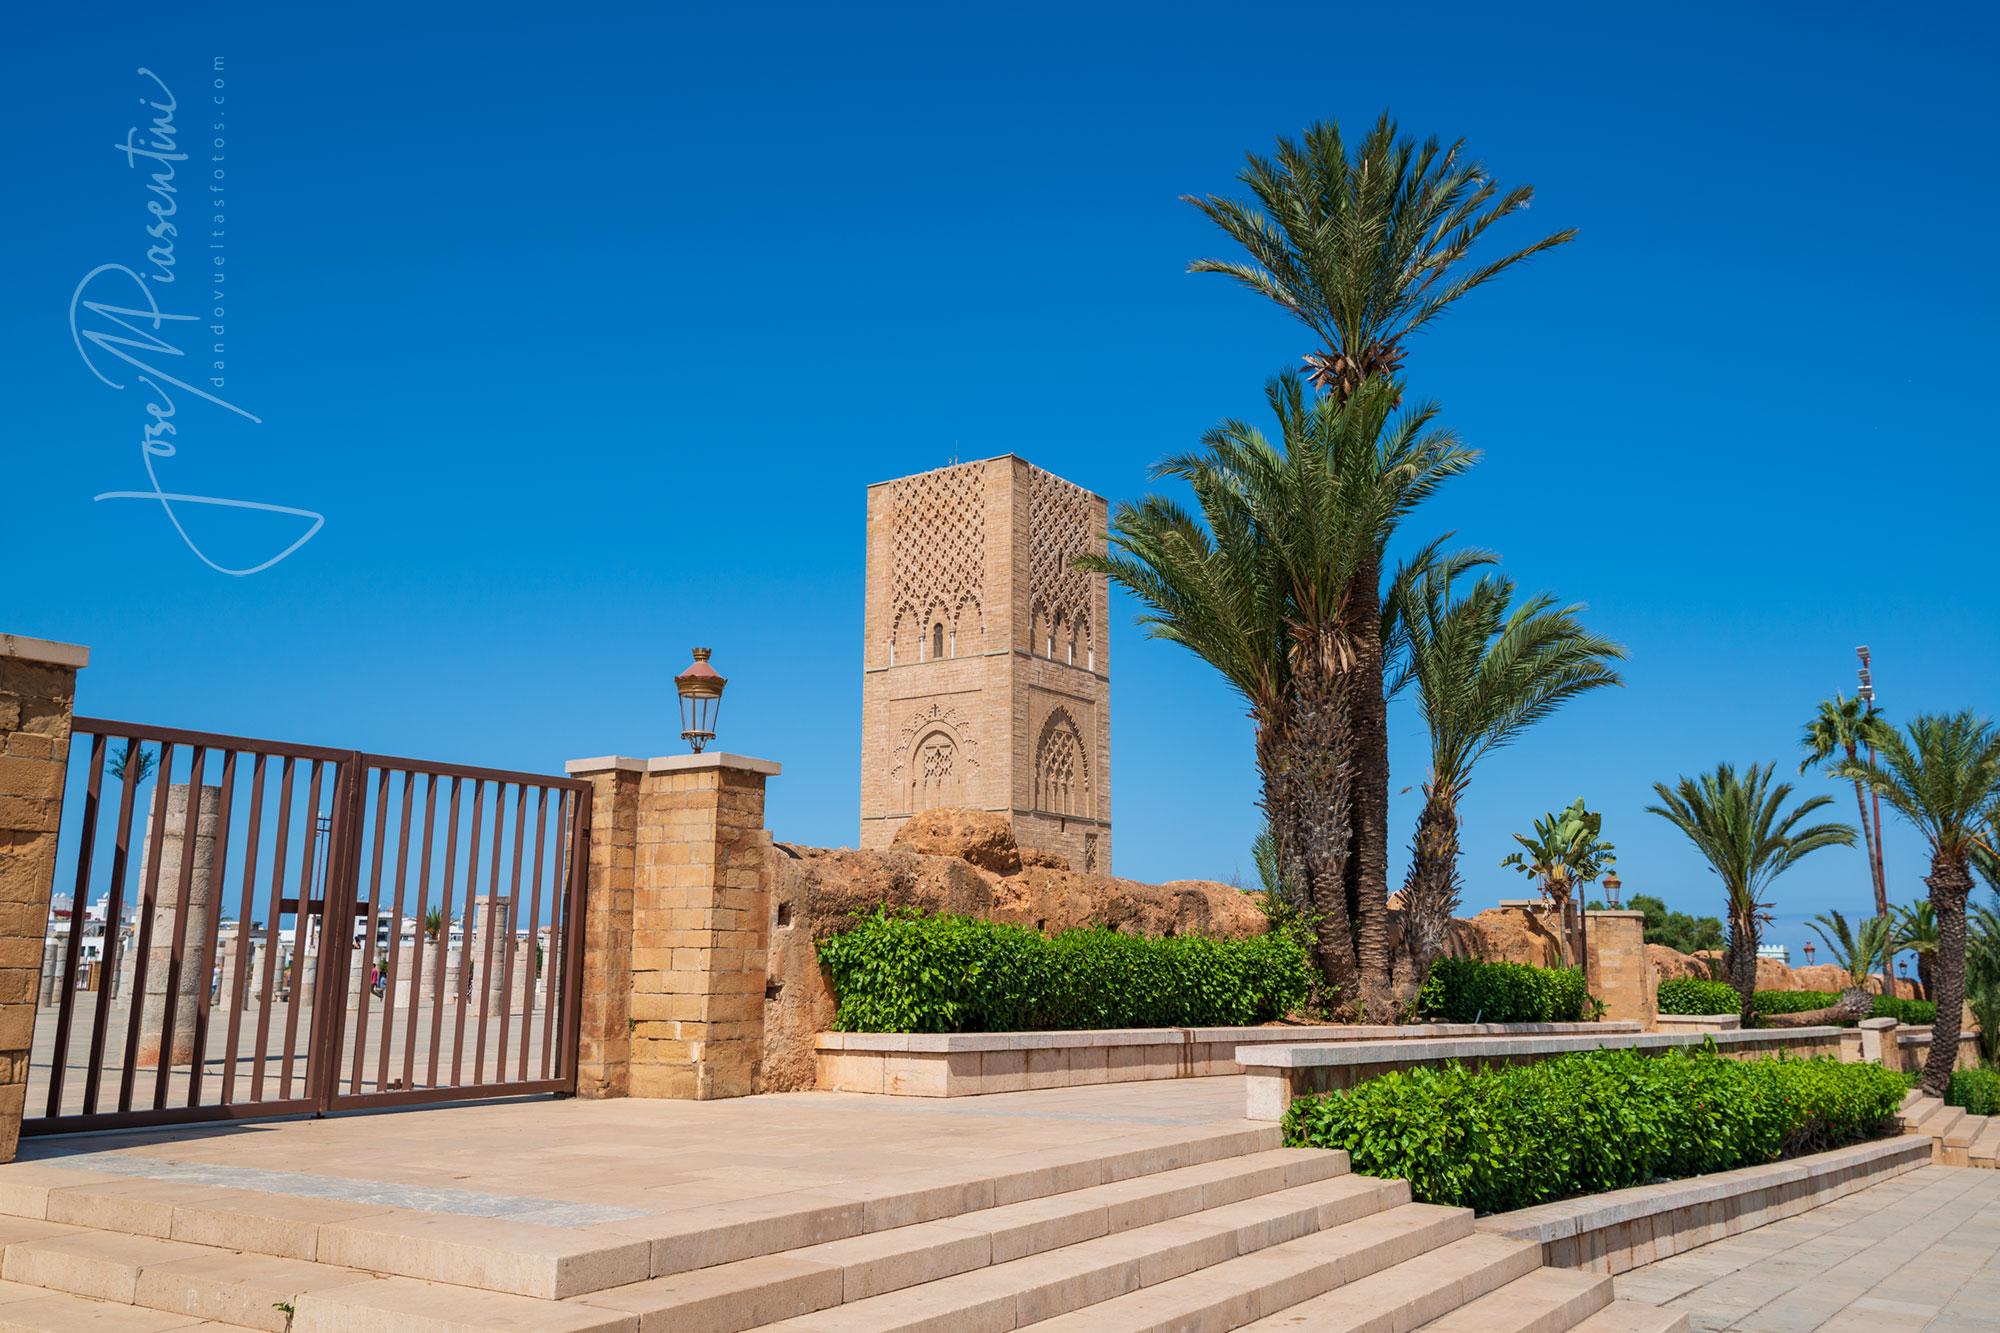 Torre Hassan Rabat Marroc